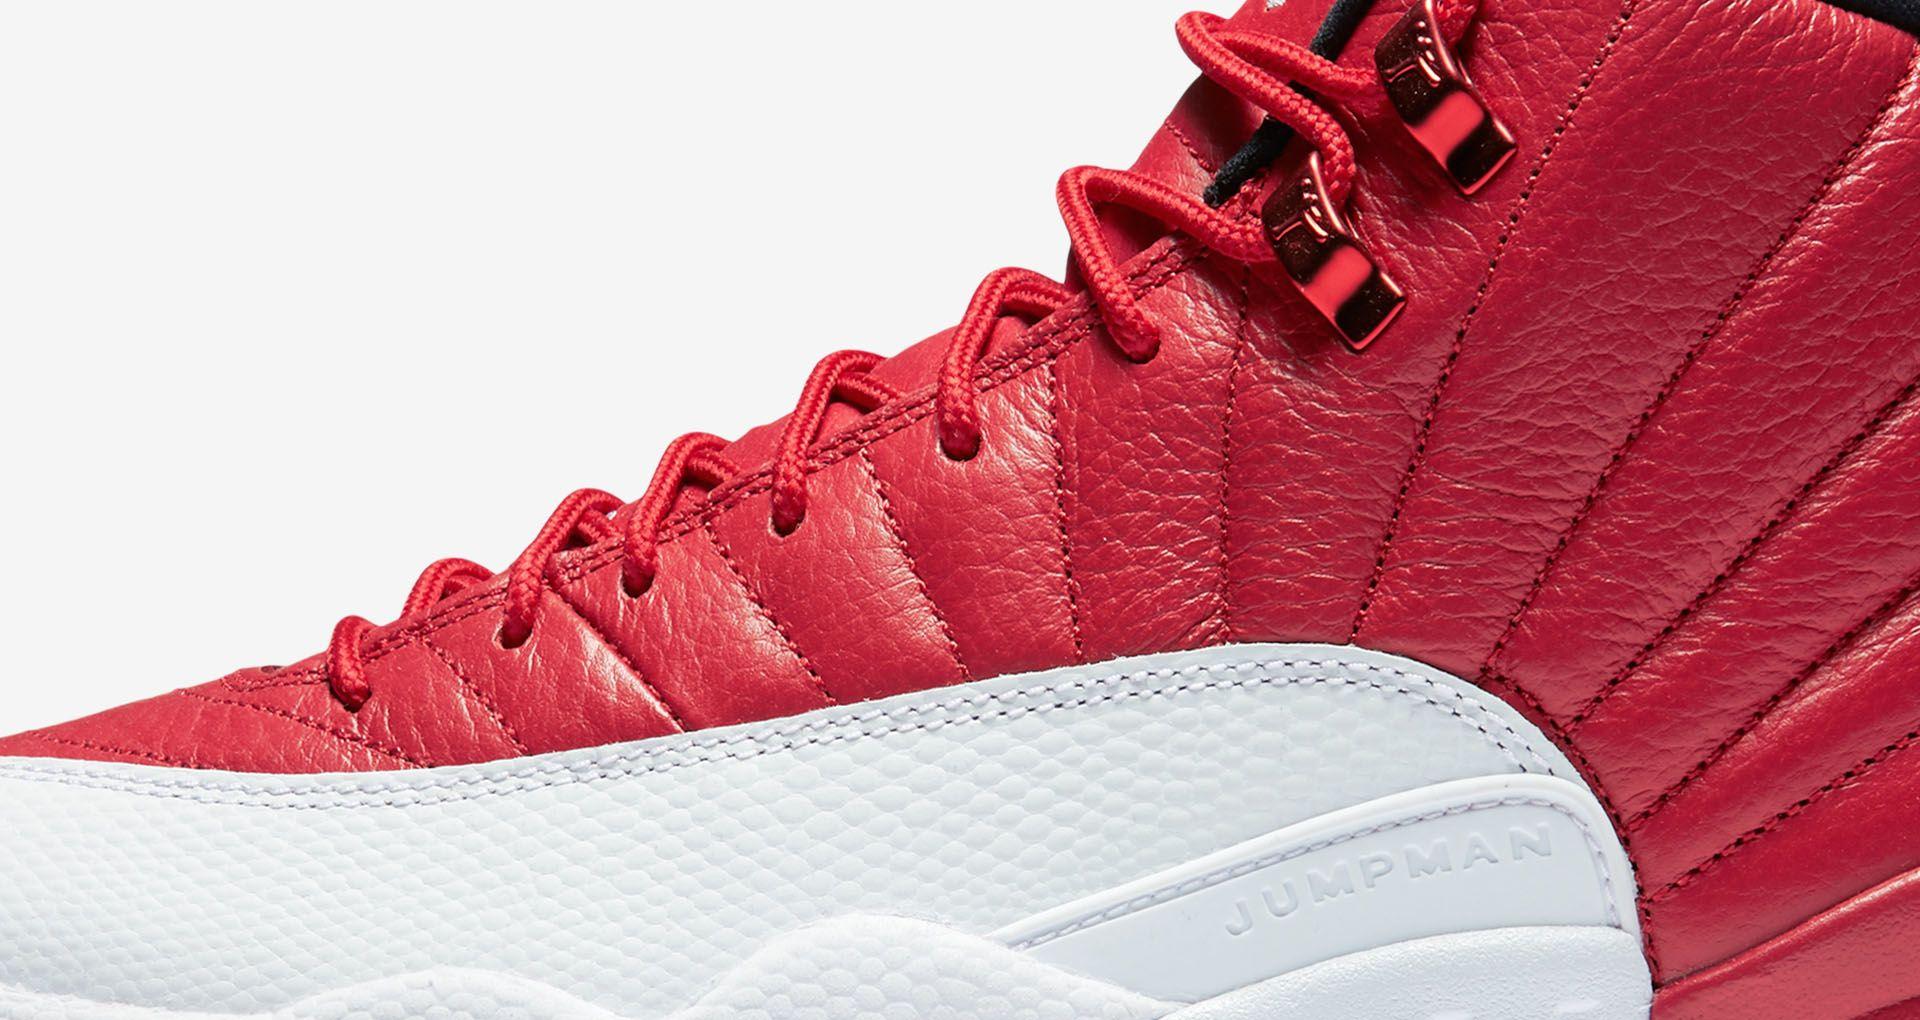 sale retailer c58d9 5f7f5 Air Jordan 12 Retro  Alternate  Release Date